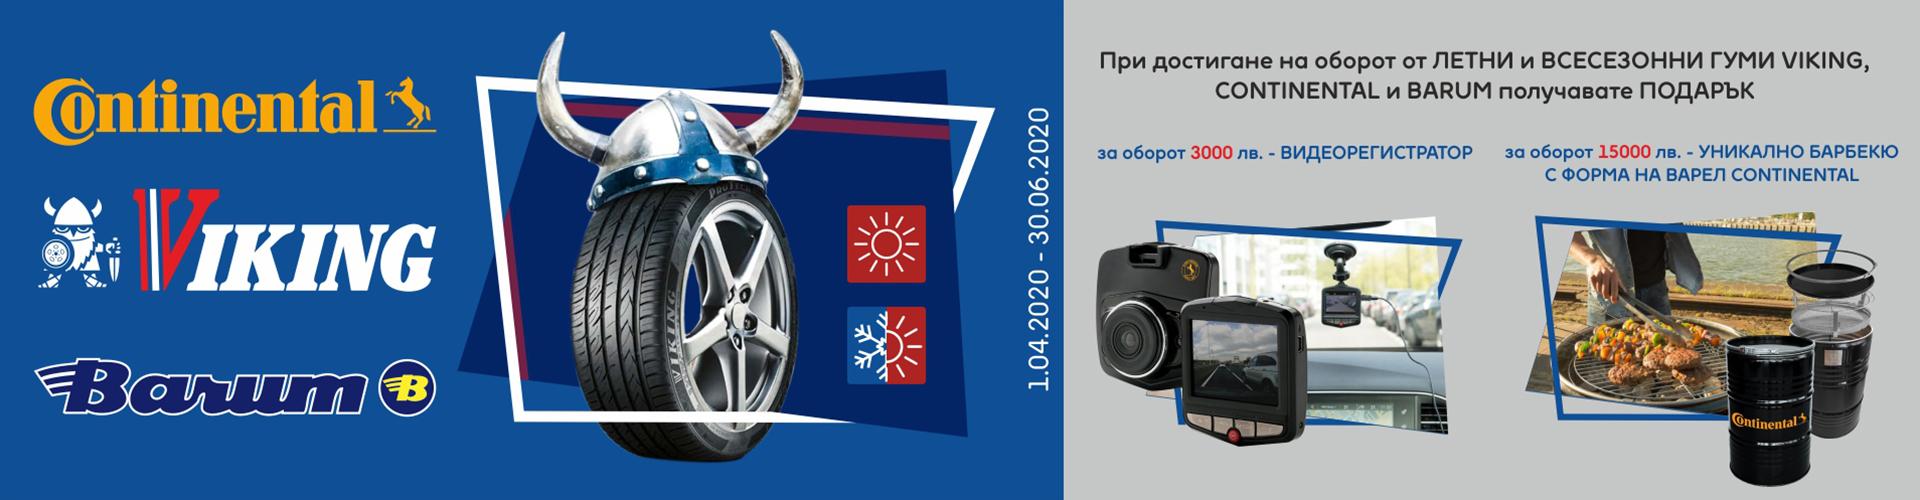 promo_viking_continental_barum_2020_1_banner.jpg